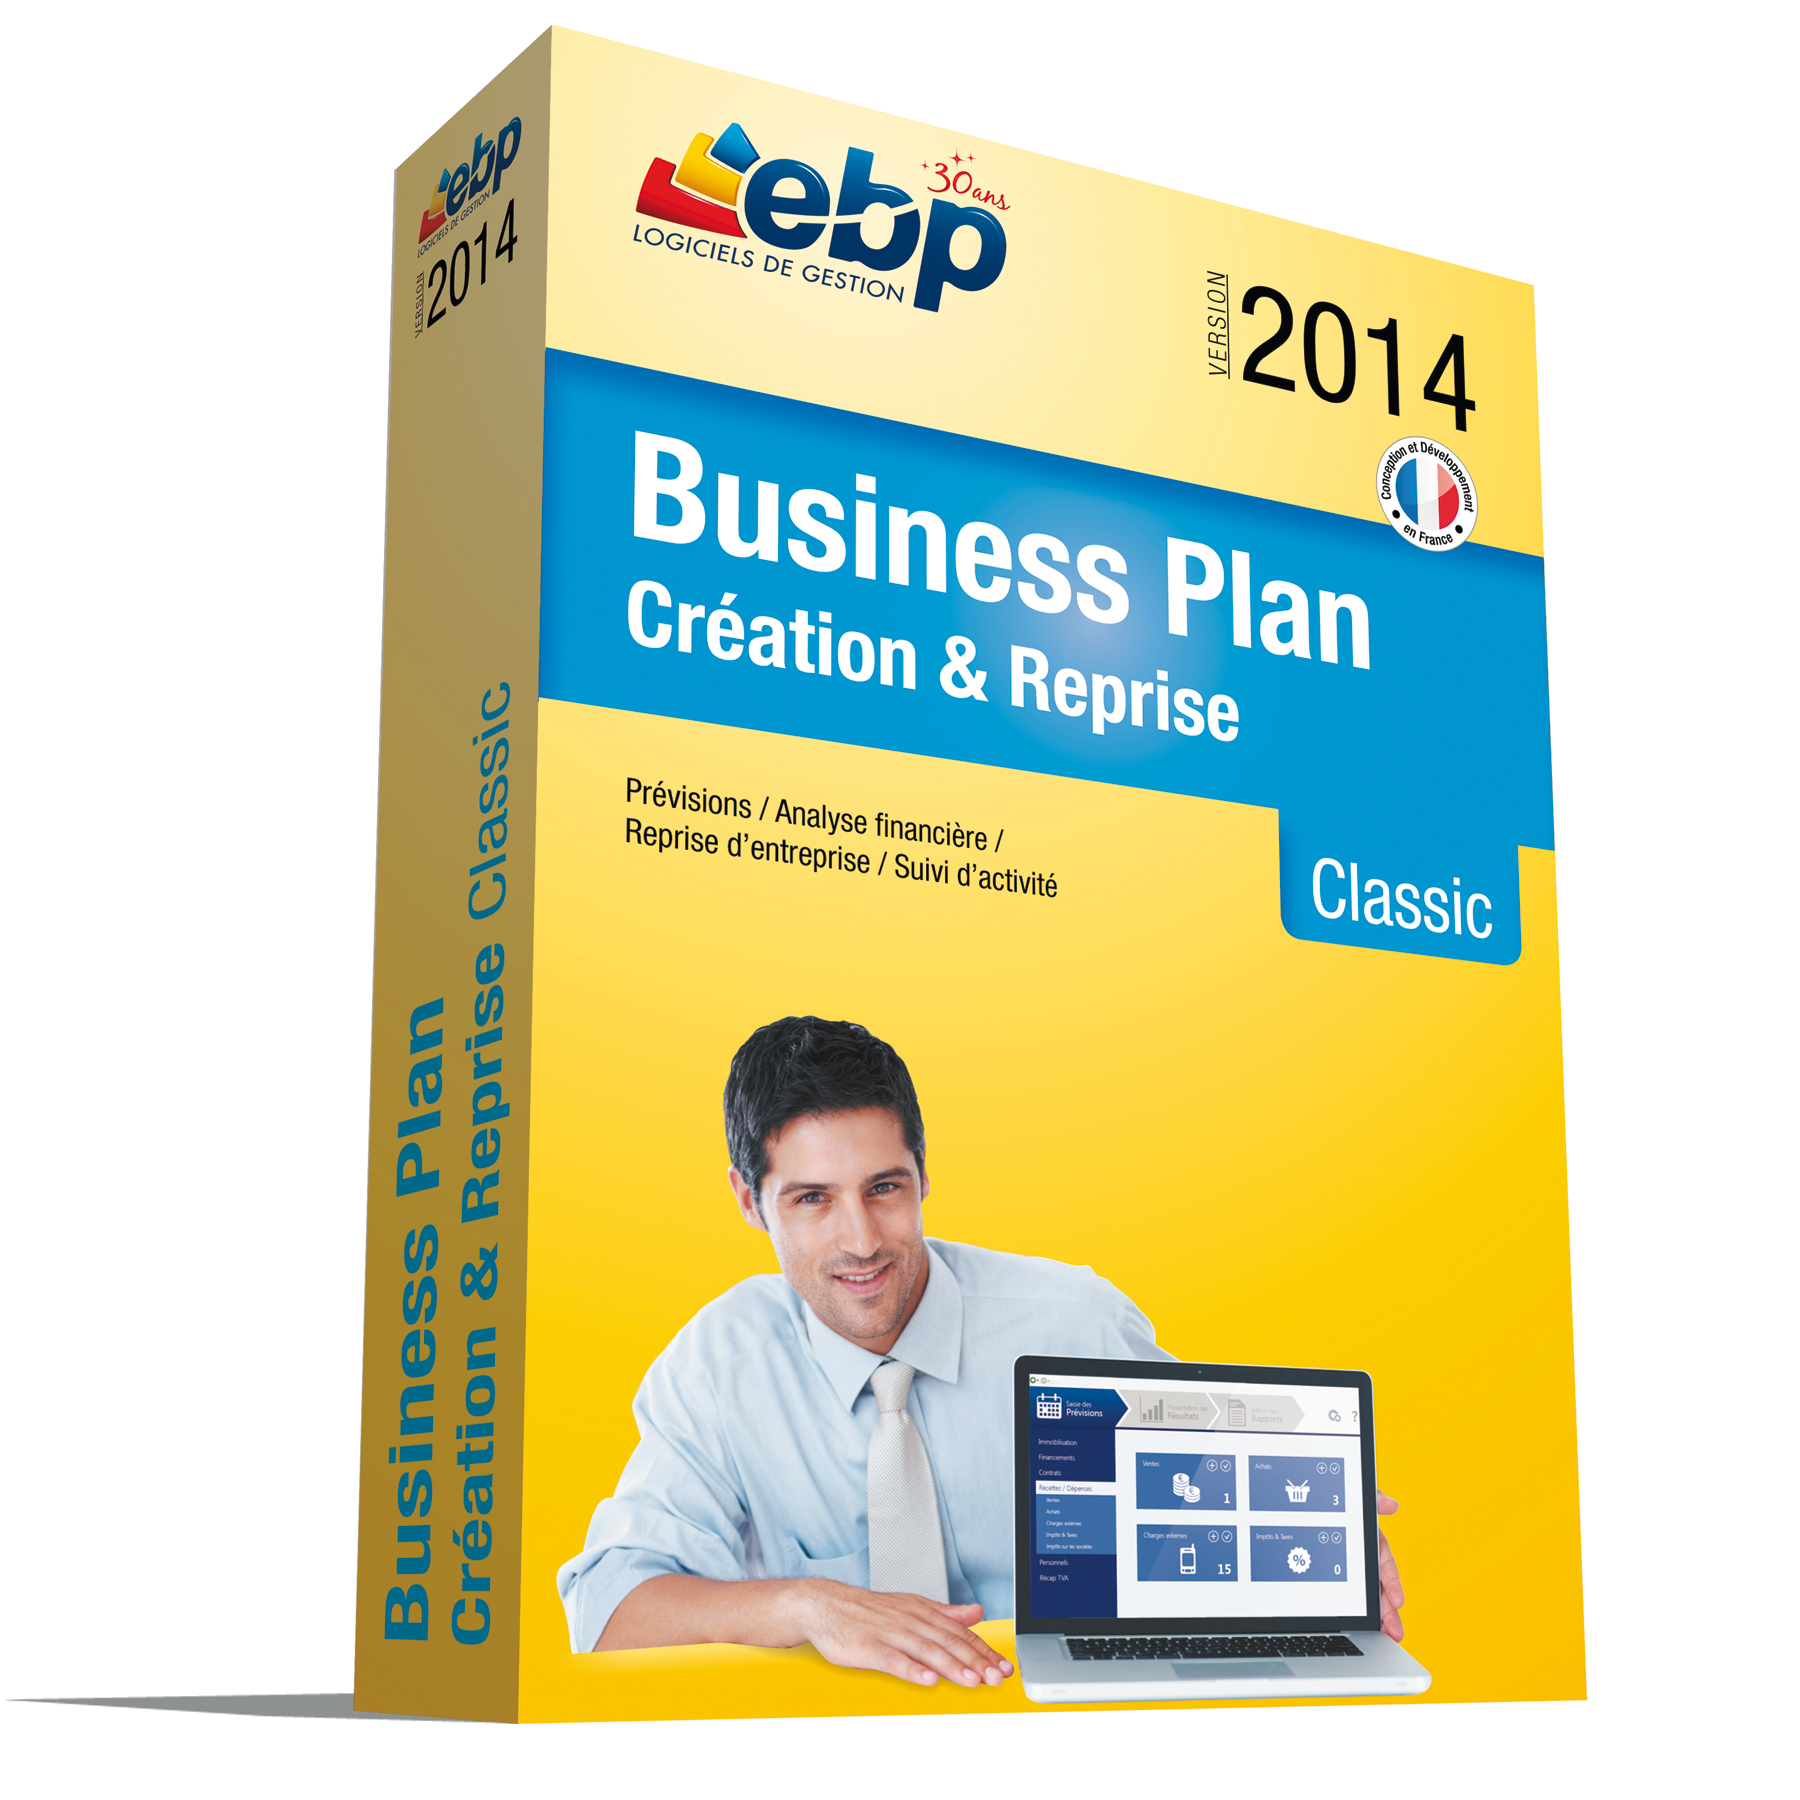 Ebp Business Plan Cr Ation Reprise Classic 2014